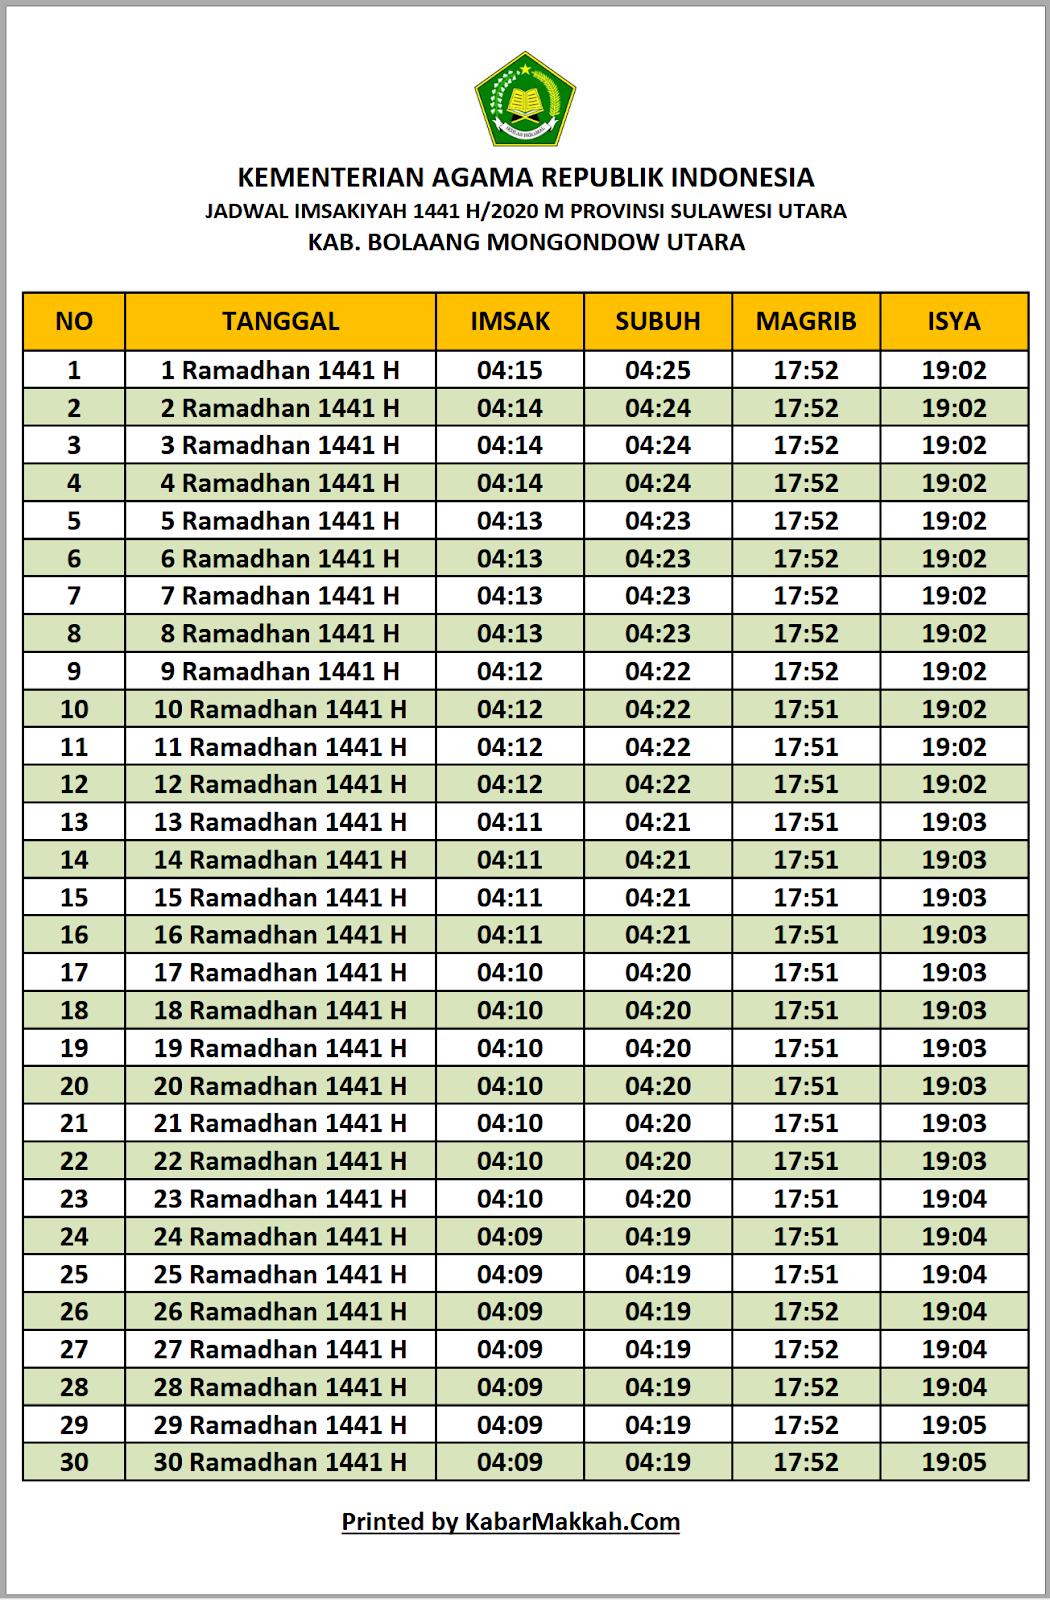 Jadwal Puasa Bolaang Mongondow Utara 2020